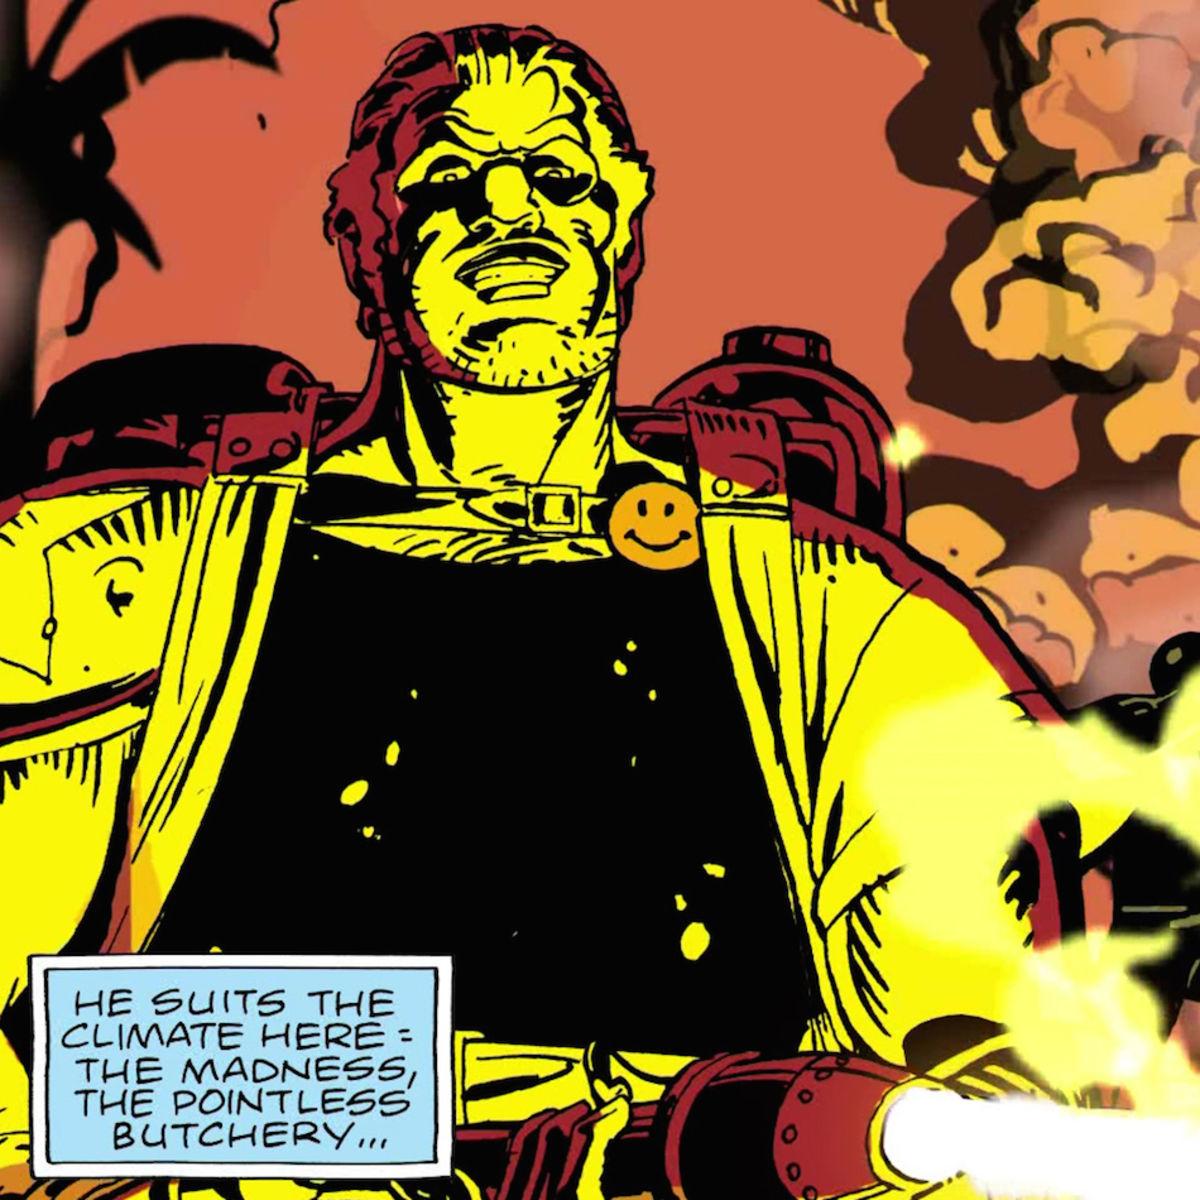 The-Comedian-in-the-Watchmen-comic.jpg